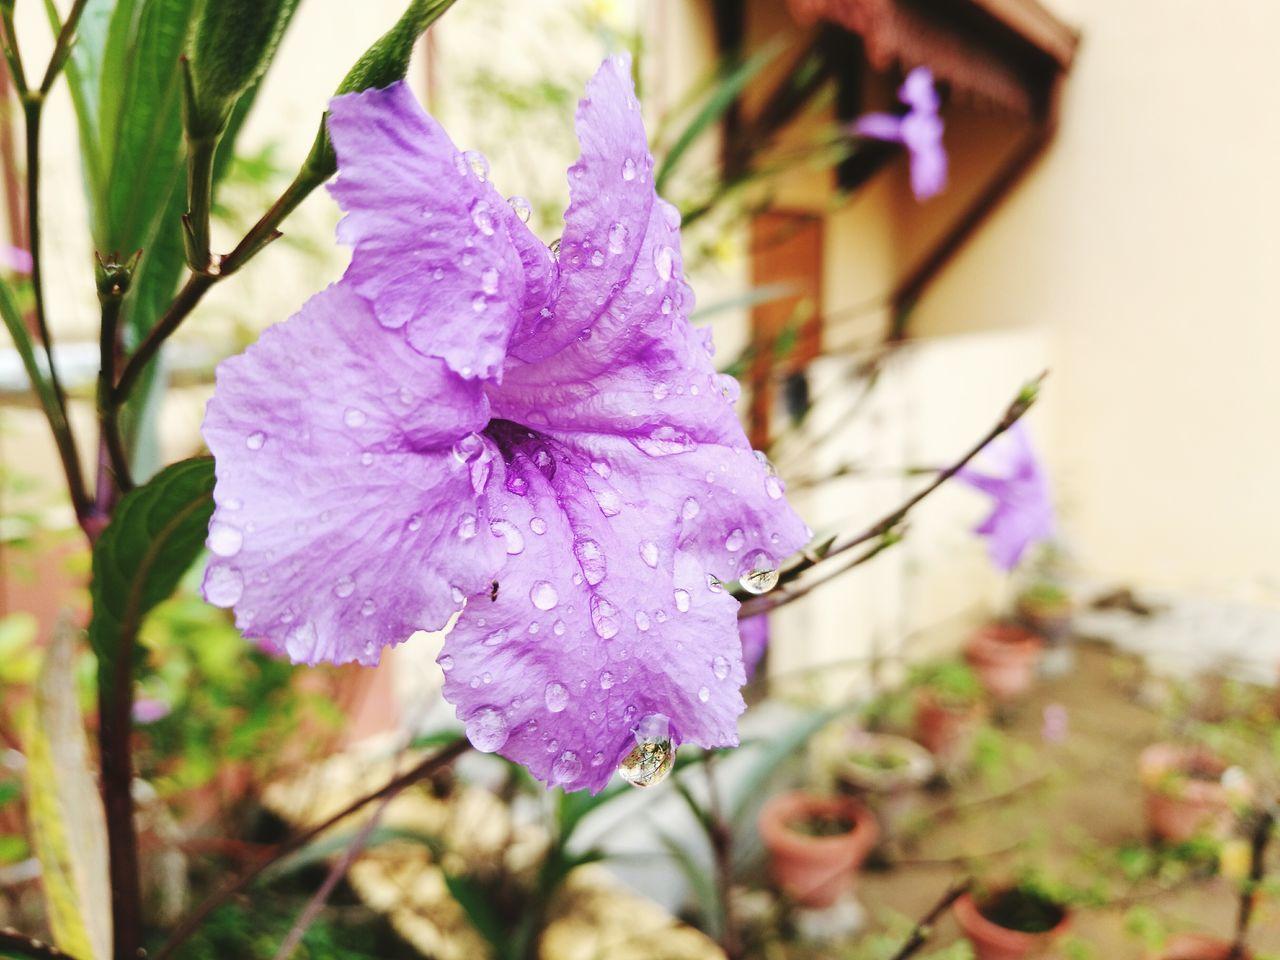 Flower Nature Purple Fragility Beauty In Nature Freshness Flower Head Rain Drops On Leaves